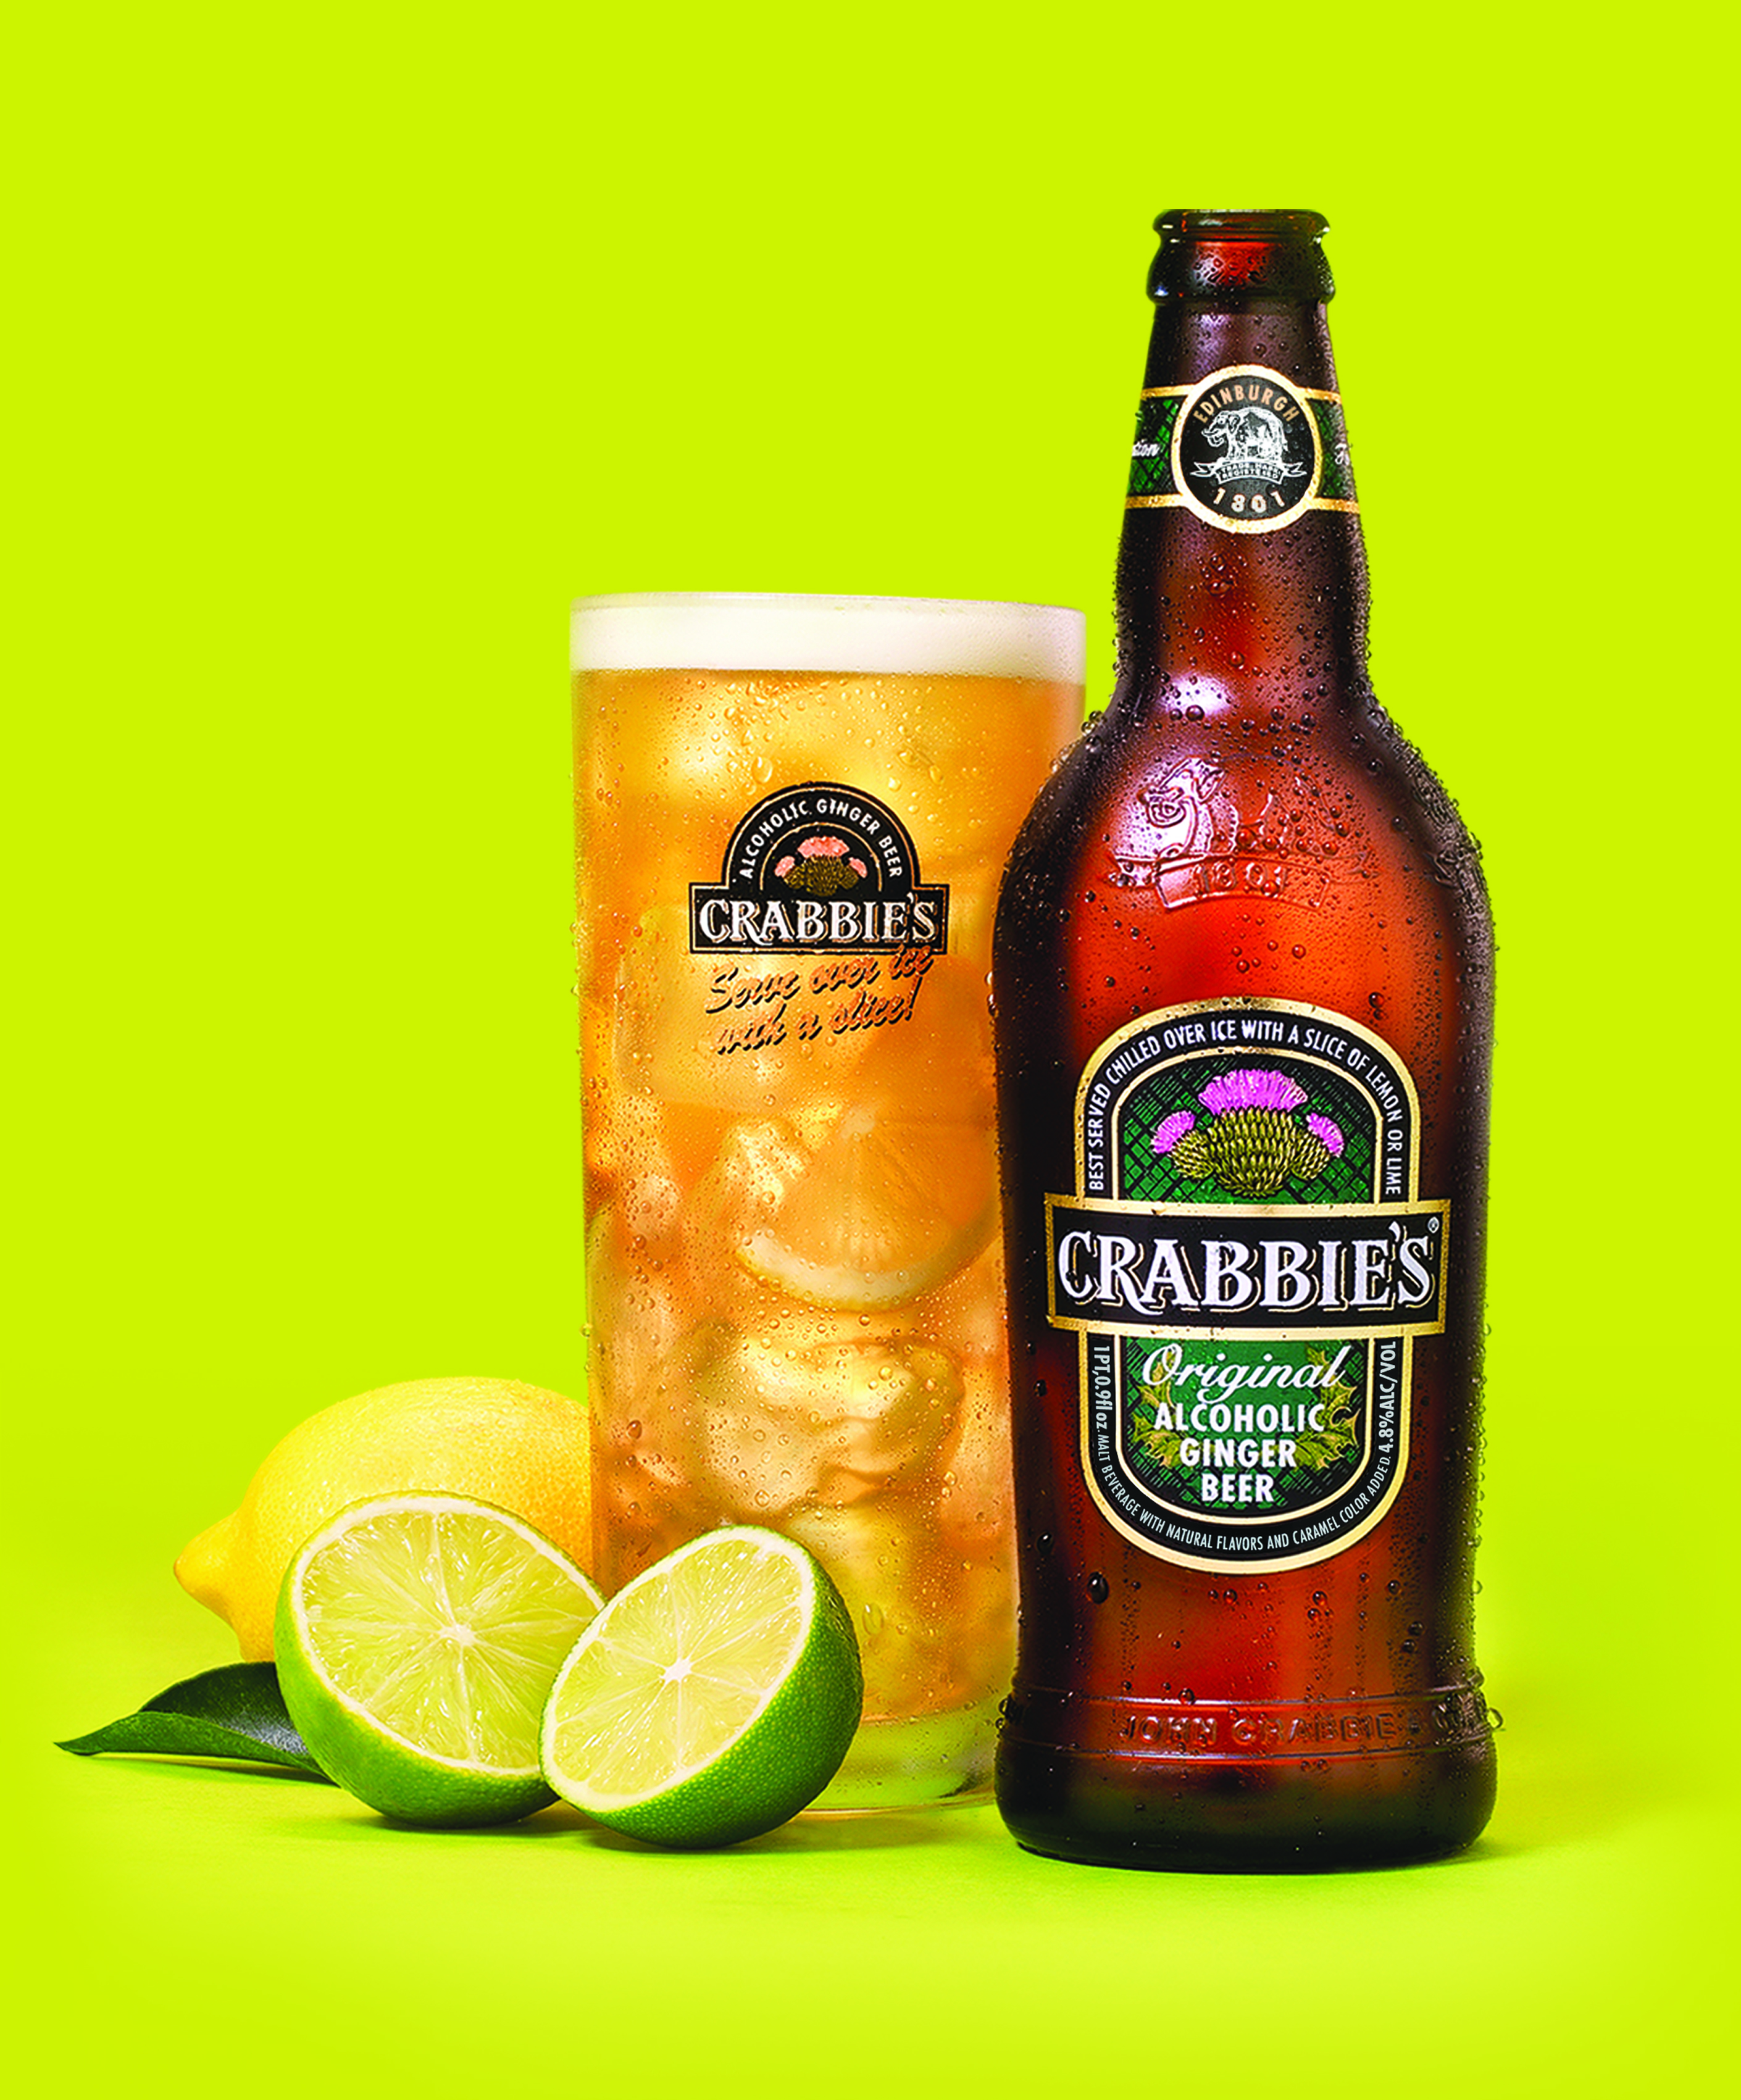 Review: Crabbie's Original Alcoholic Ginger Beer – Drinkhacker